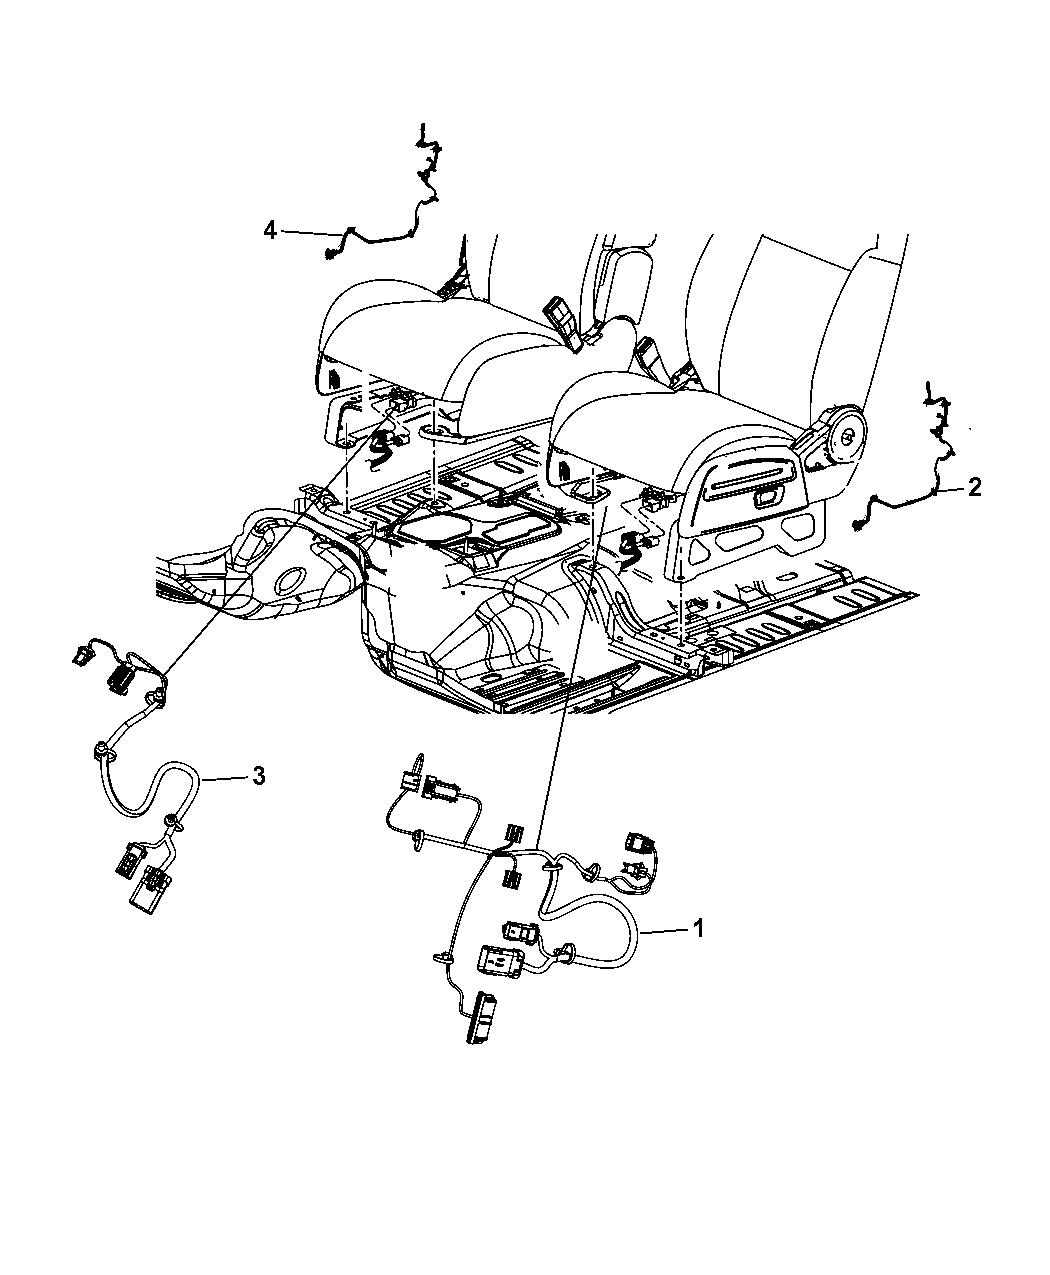 Jeep Liberty Wiring